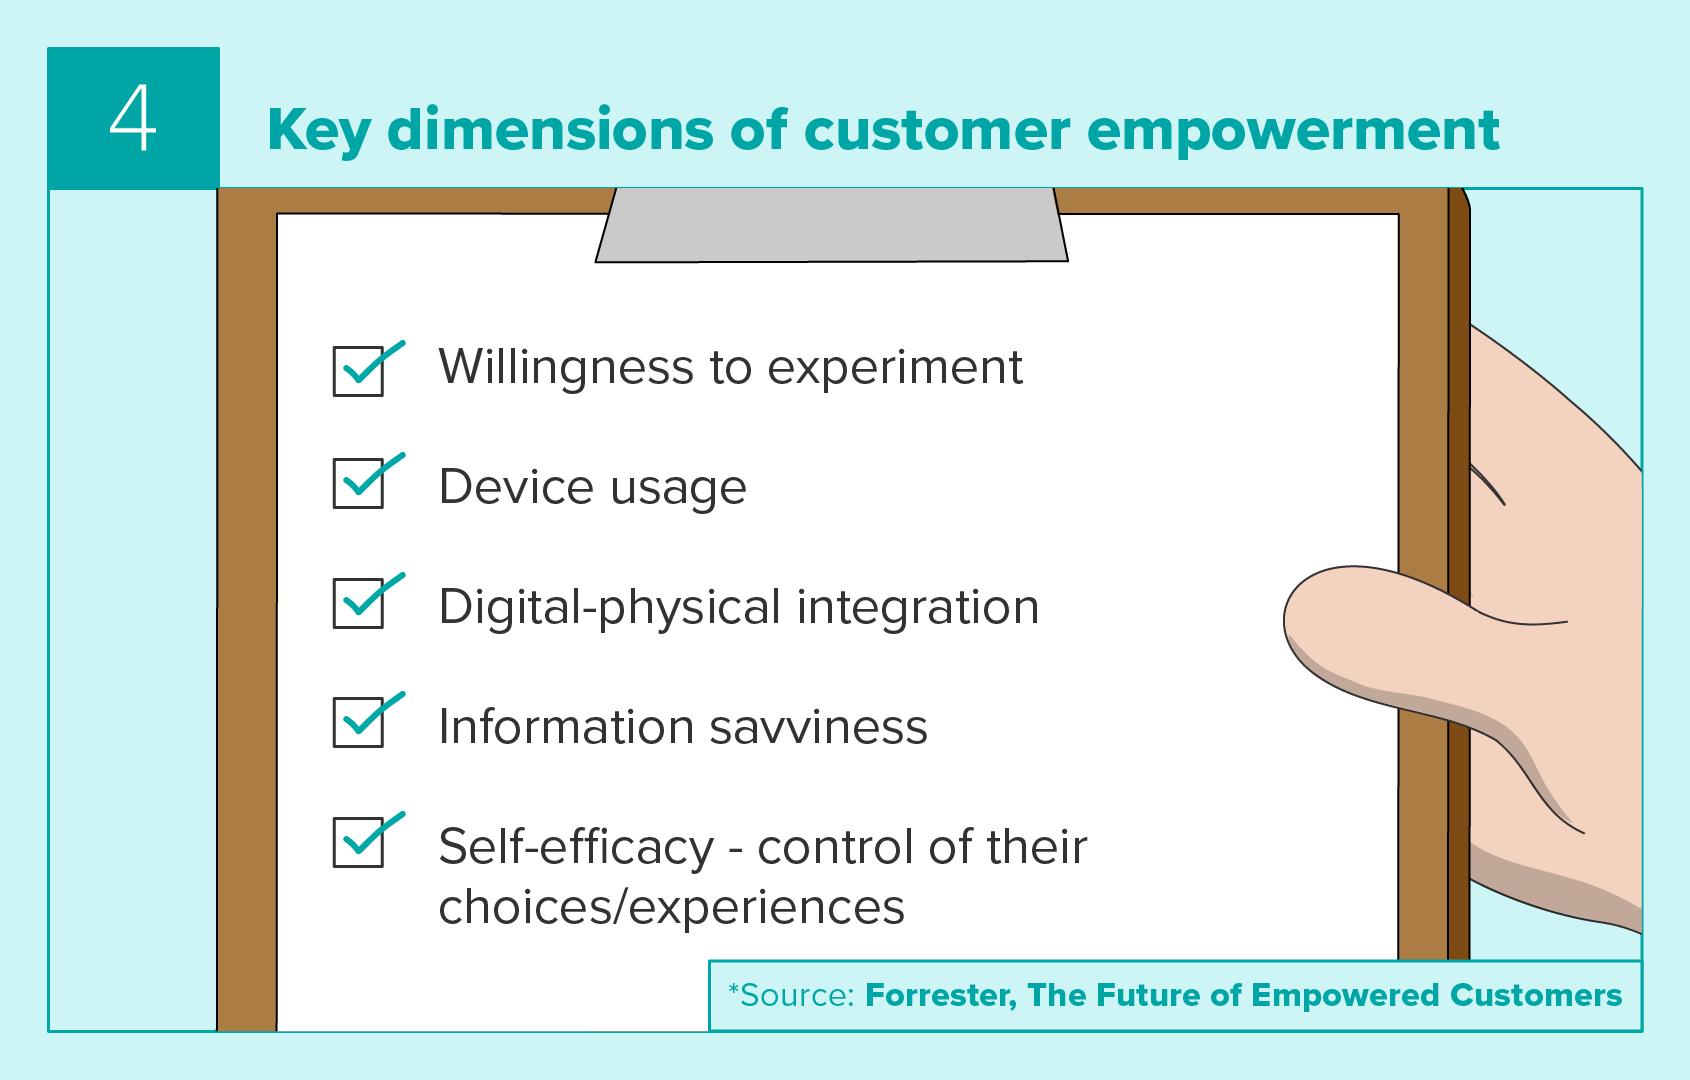 Key dimensions of customer empowerment